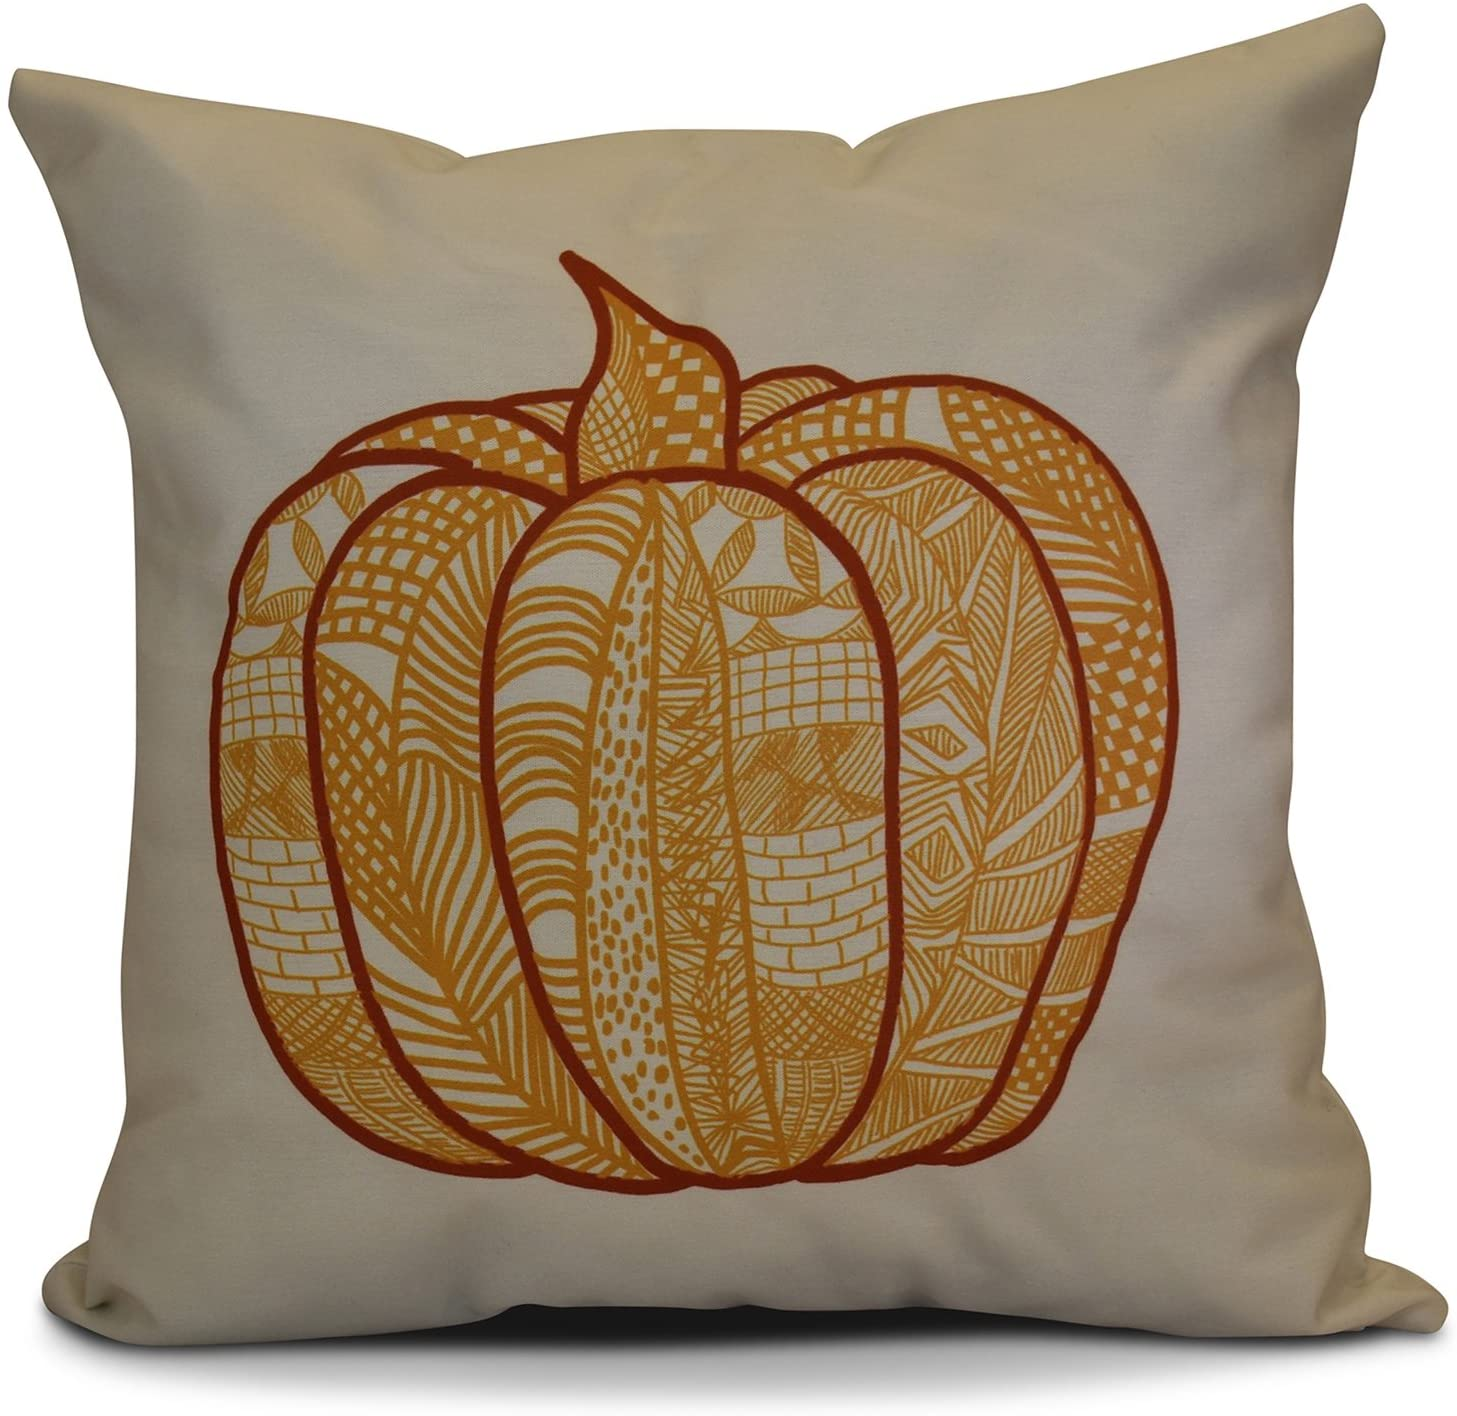 E by design PHGN714YE13-26 26 x 26-inch, Pumpkin Patch, Geometric Print, 26x26, Yellow